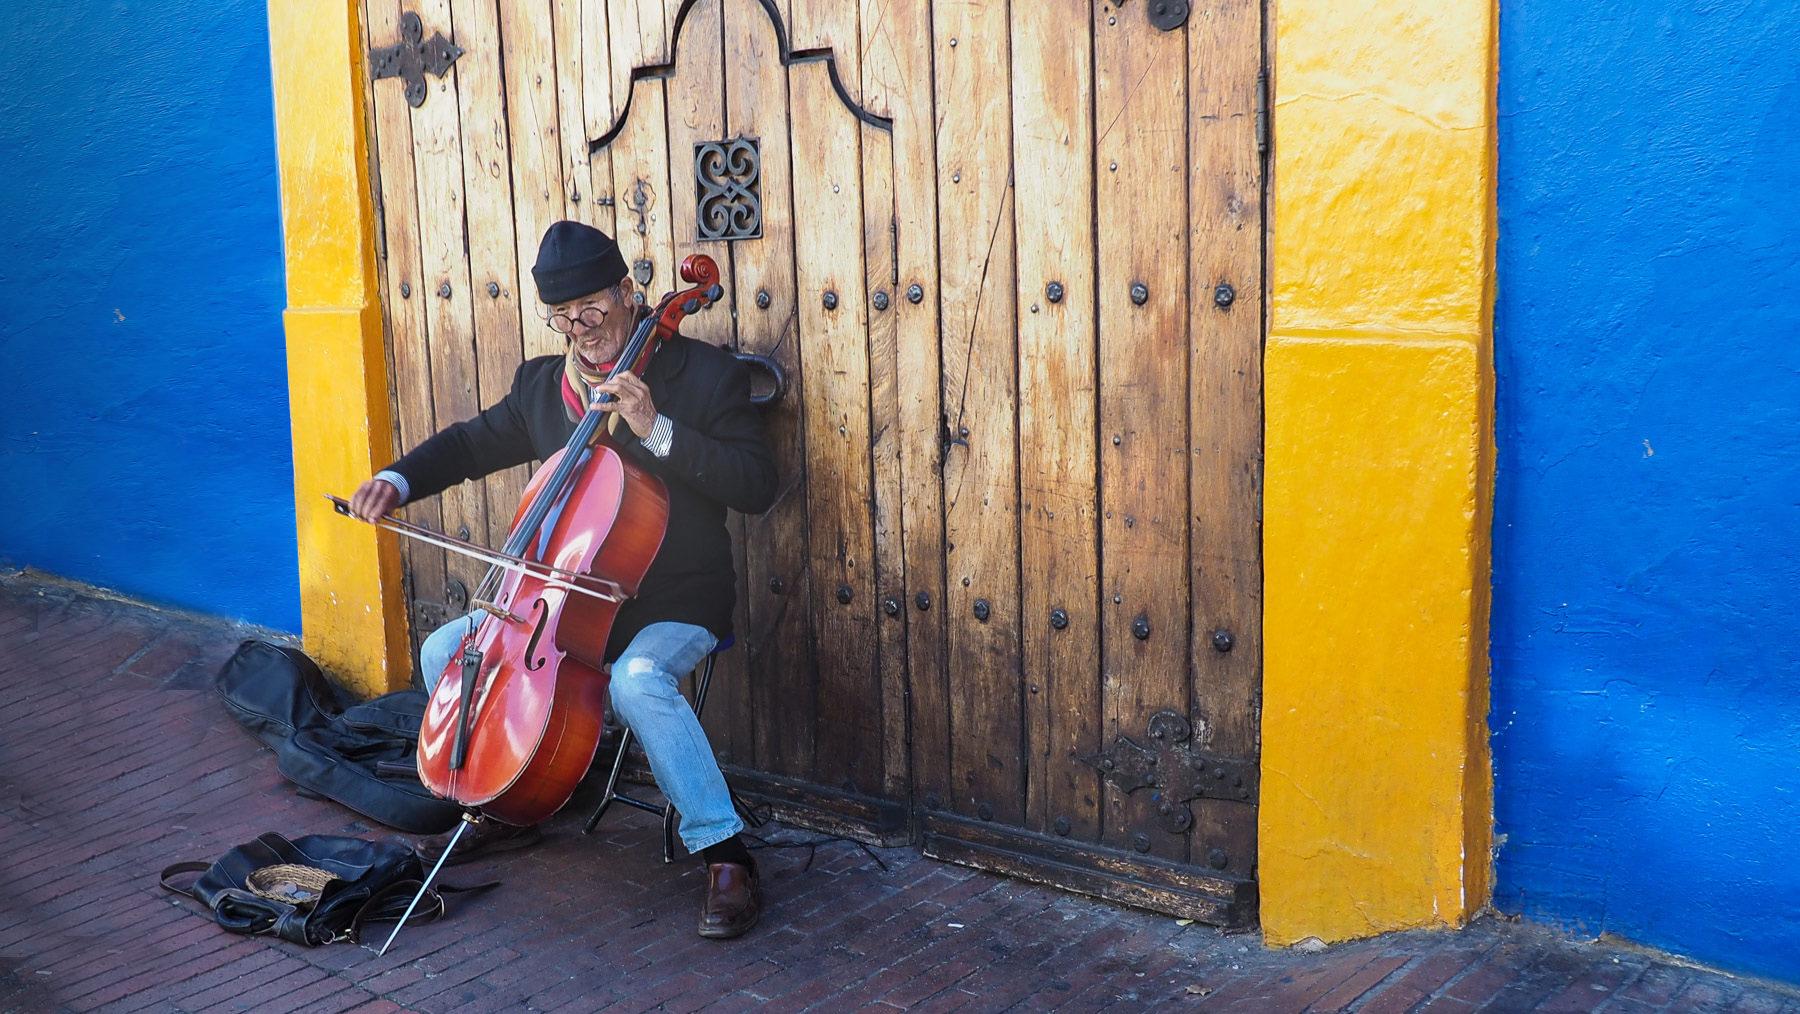 Straßenmusiker in Bogota